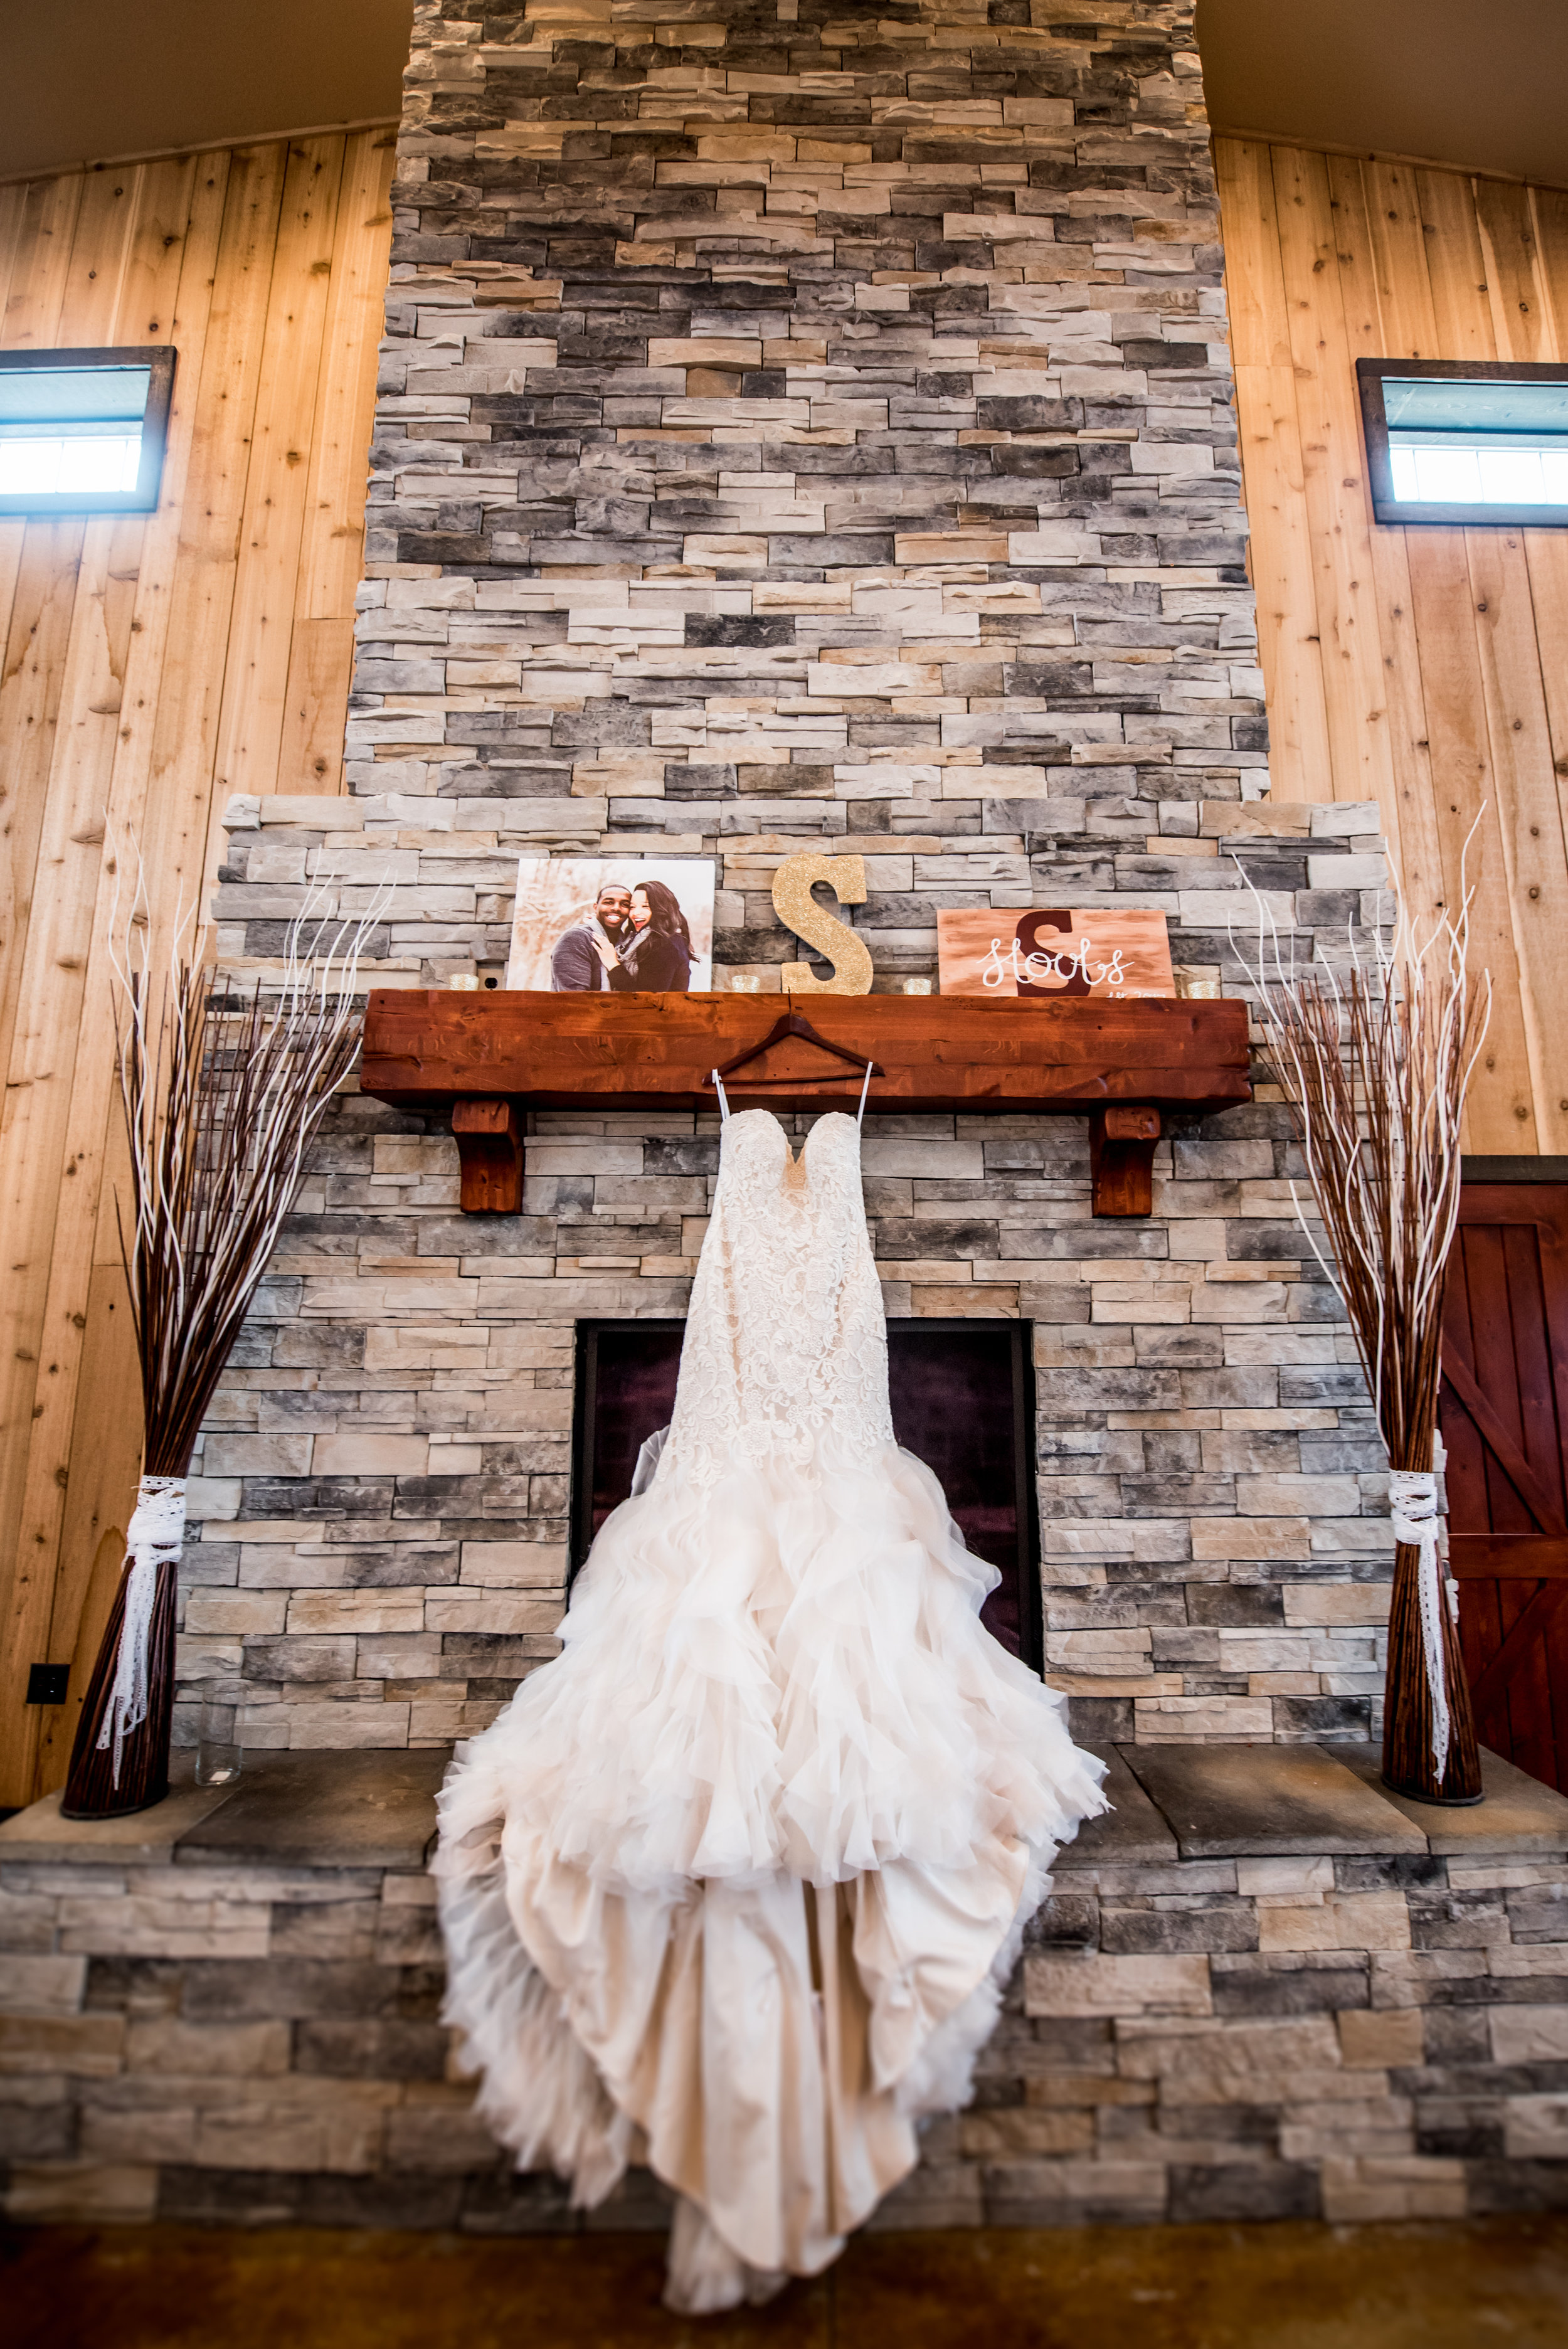 Burlington Iowa Wedding Midwest Photographer Melissa Cervantes _ Chantelle and Isaiah 1.jpg